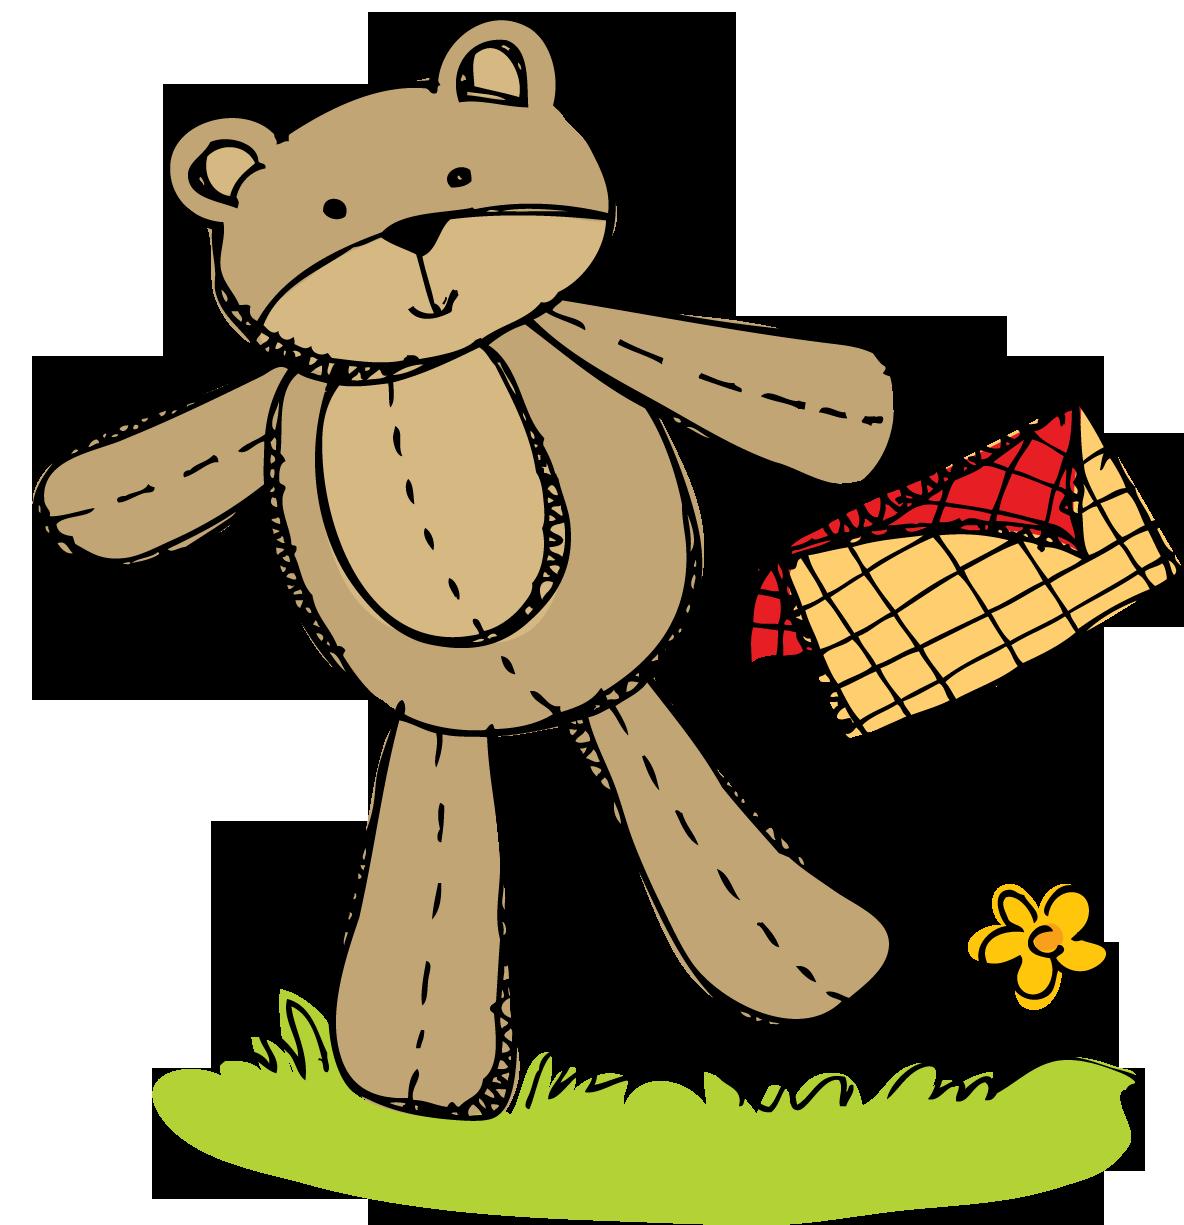 Teddy bear picnic clipart free clipart black and white library Teddy Bears\' Picnic Clip art - picnic png download - 1184 ... clipart black and white library